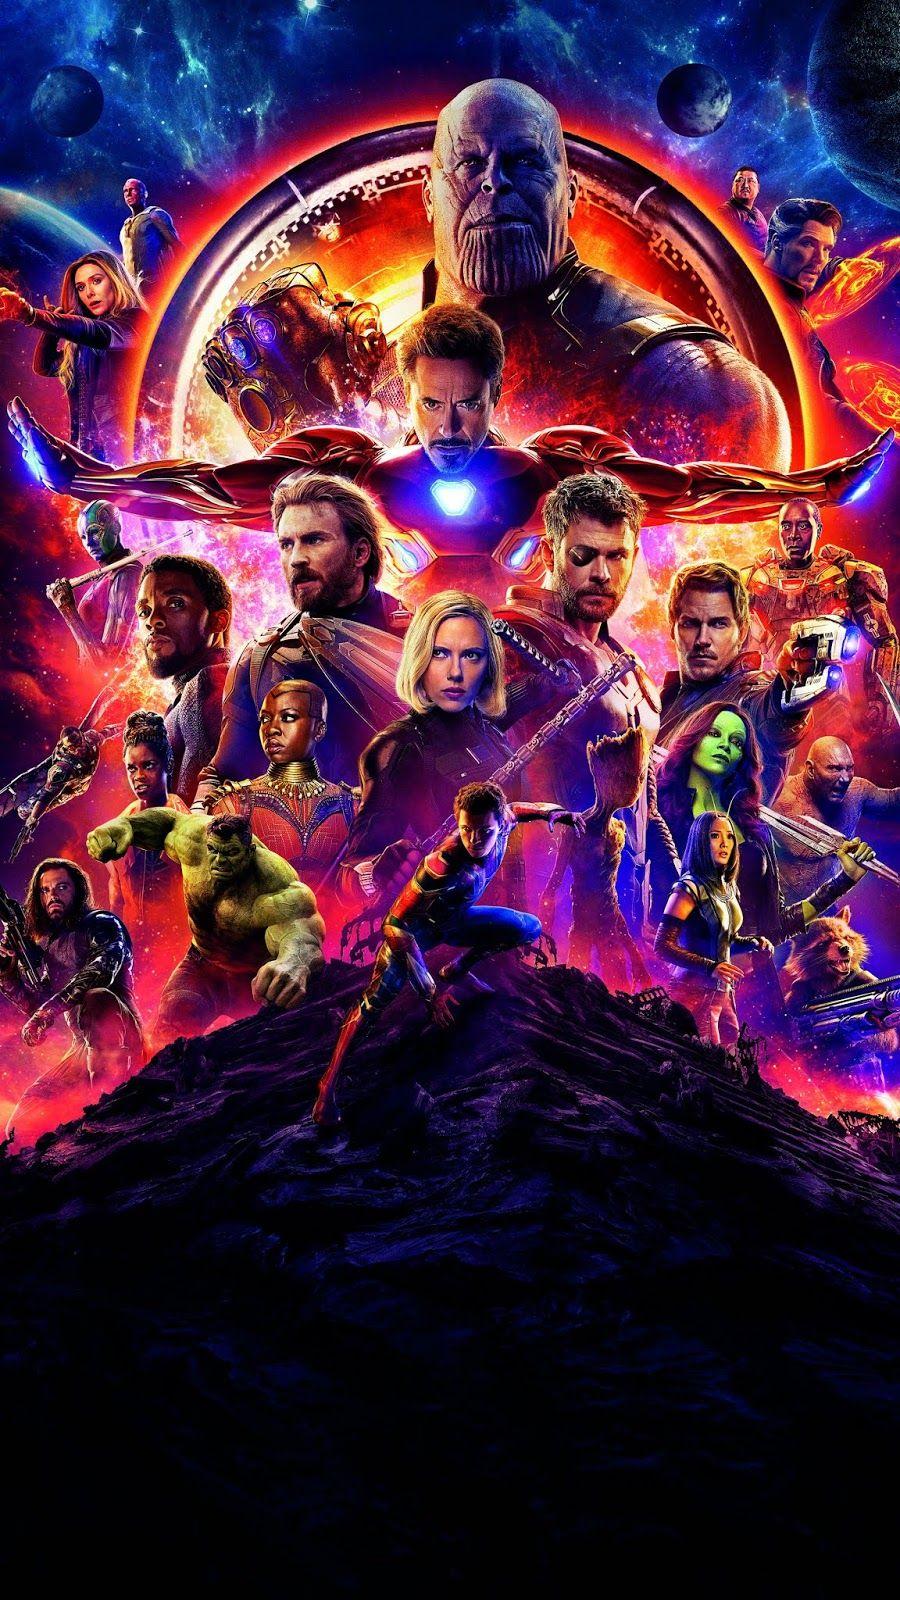 Avengers Infinity War Textless Hd Wallpaper Avengers Poster Marvel Background Marvel Posters